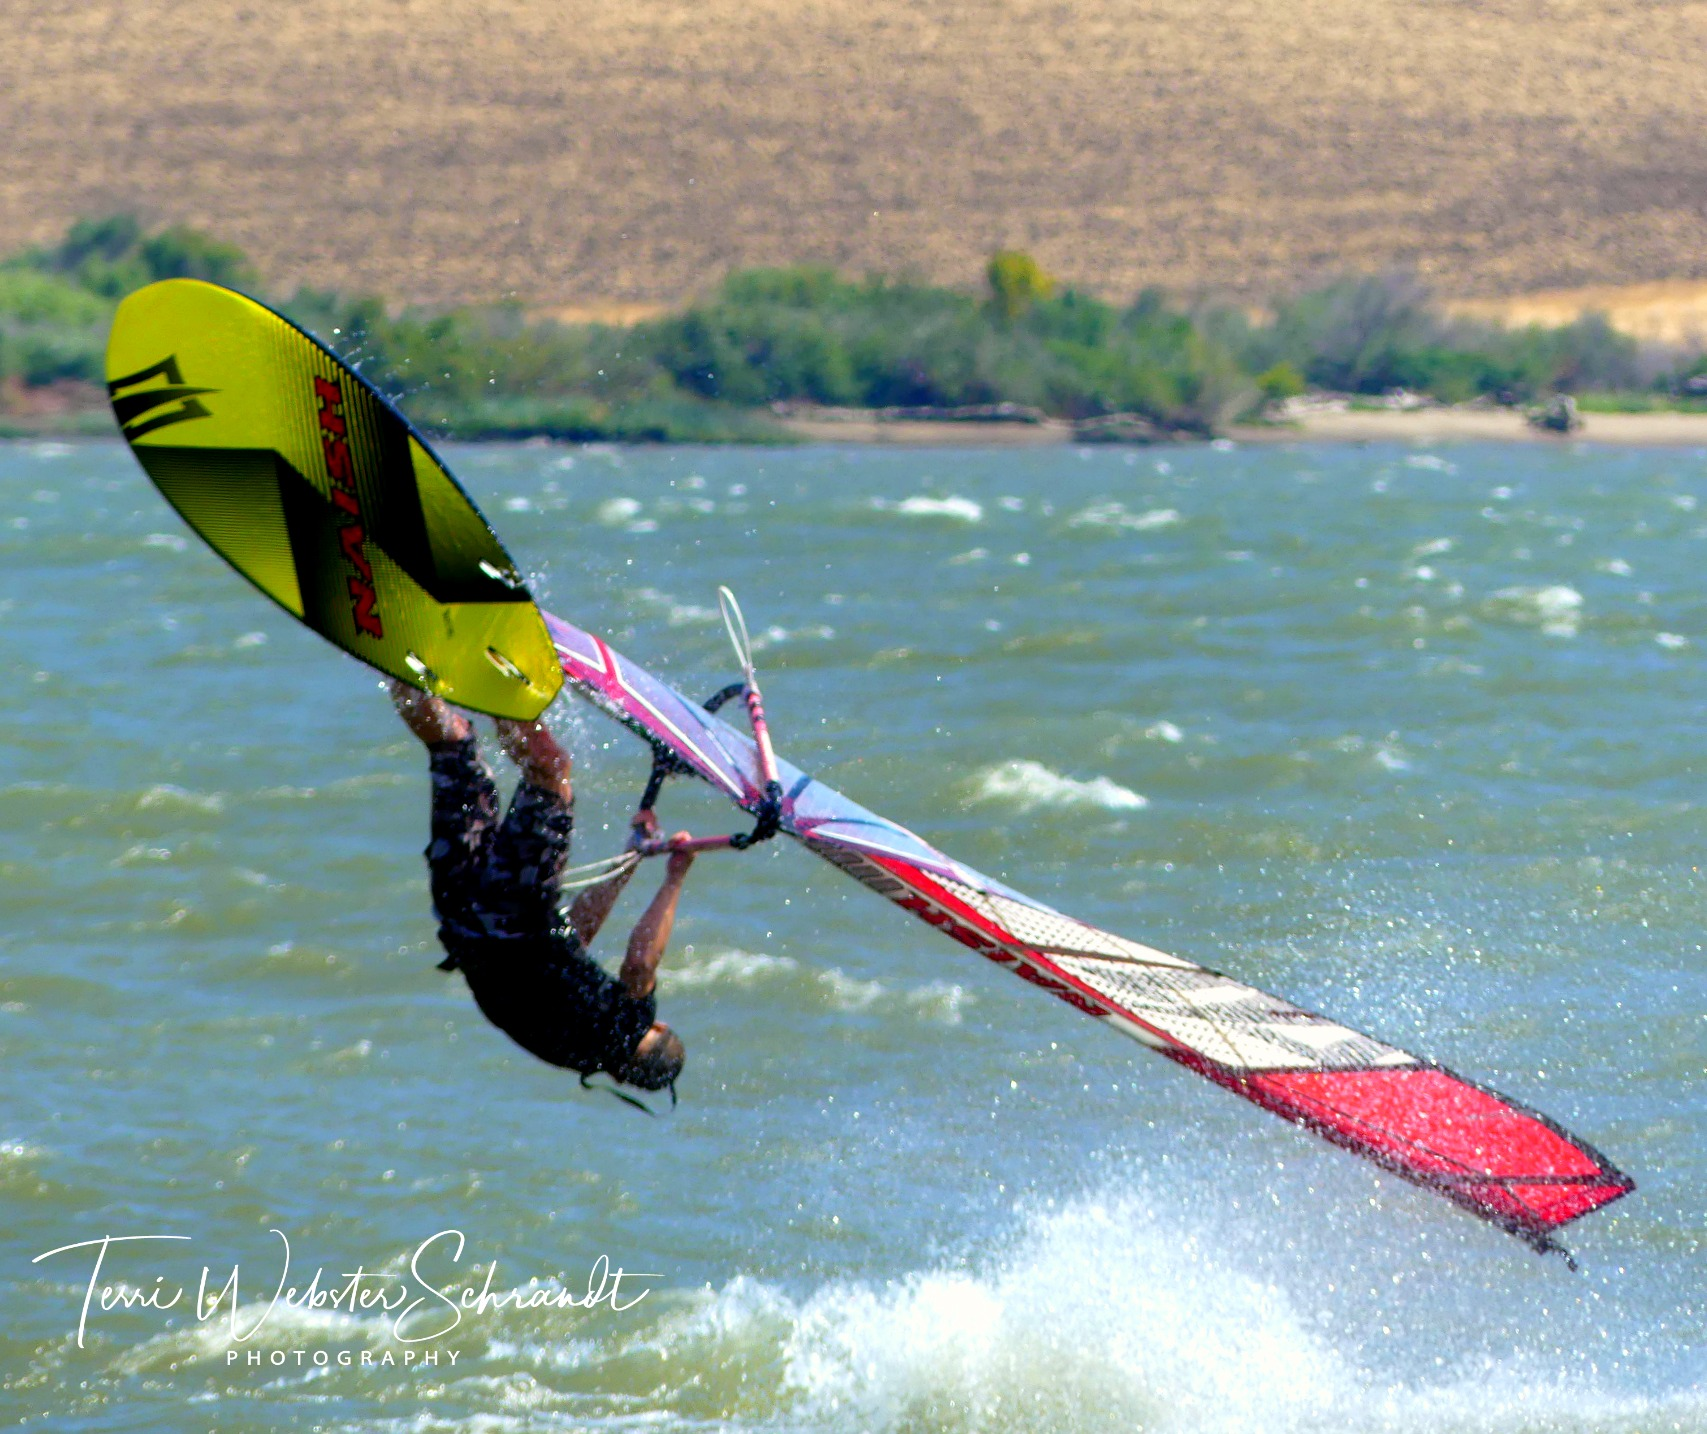 windsurfer getting air